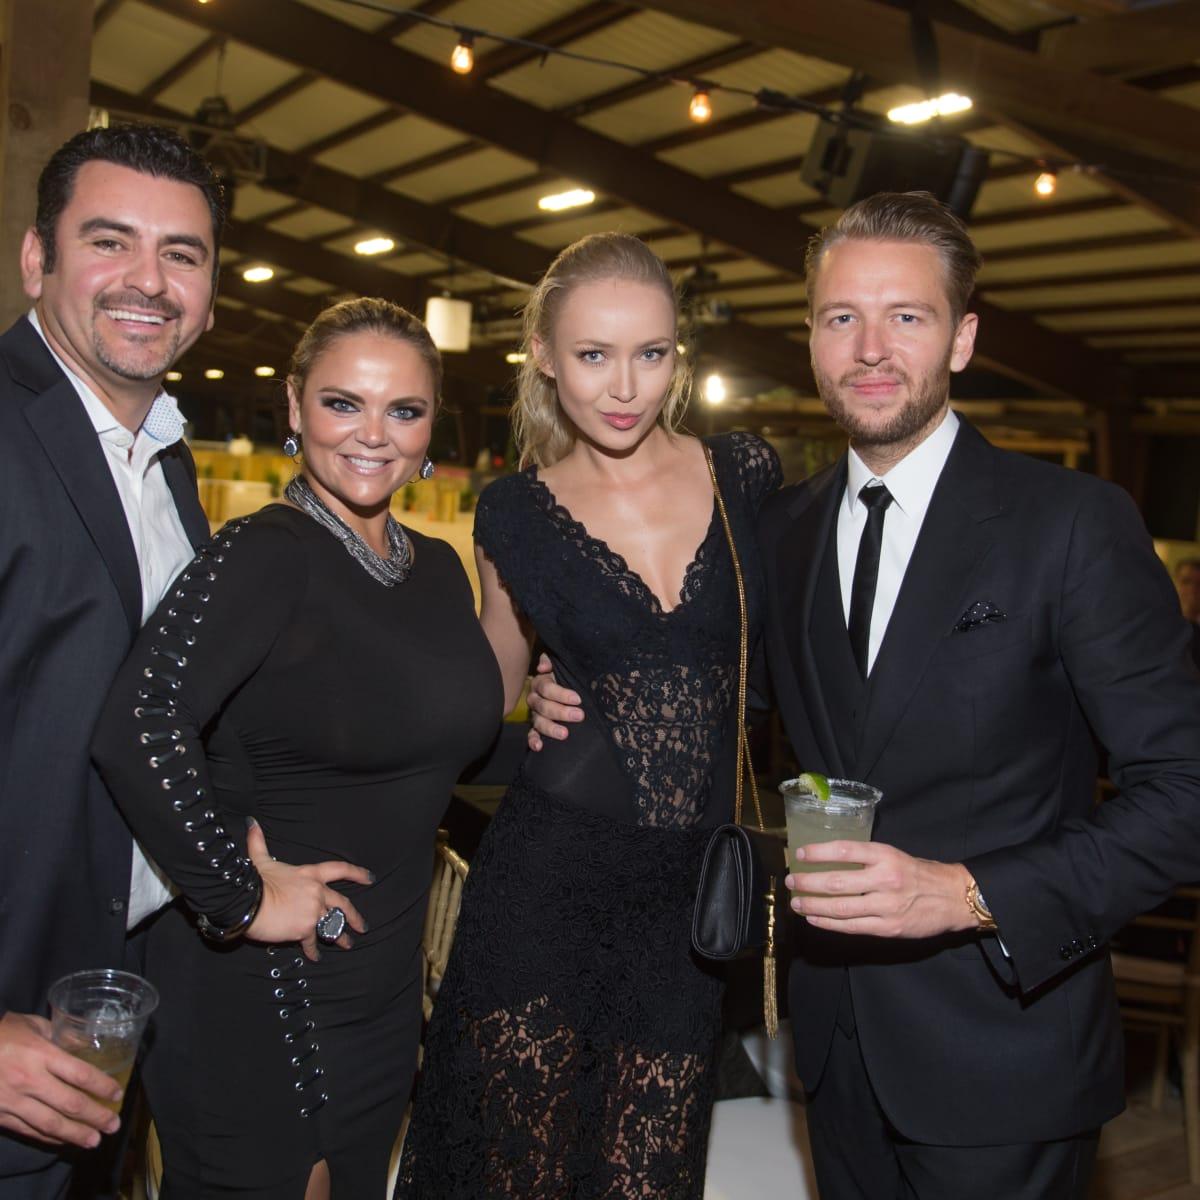 News, Shelby, Haras Cup, Nov. 2015, Connie Zubizarreta, Francisco Rivera, Ana Weber & Michael Lillelund